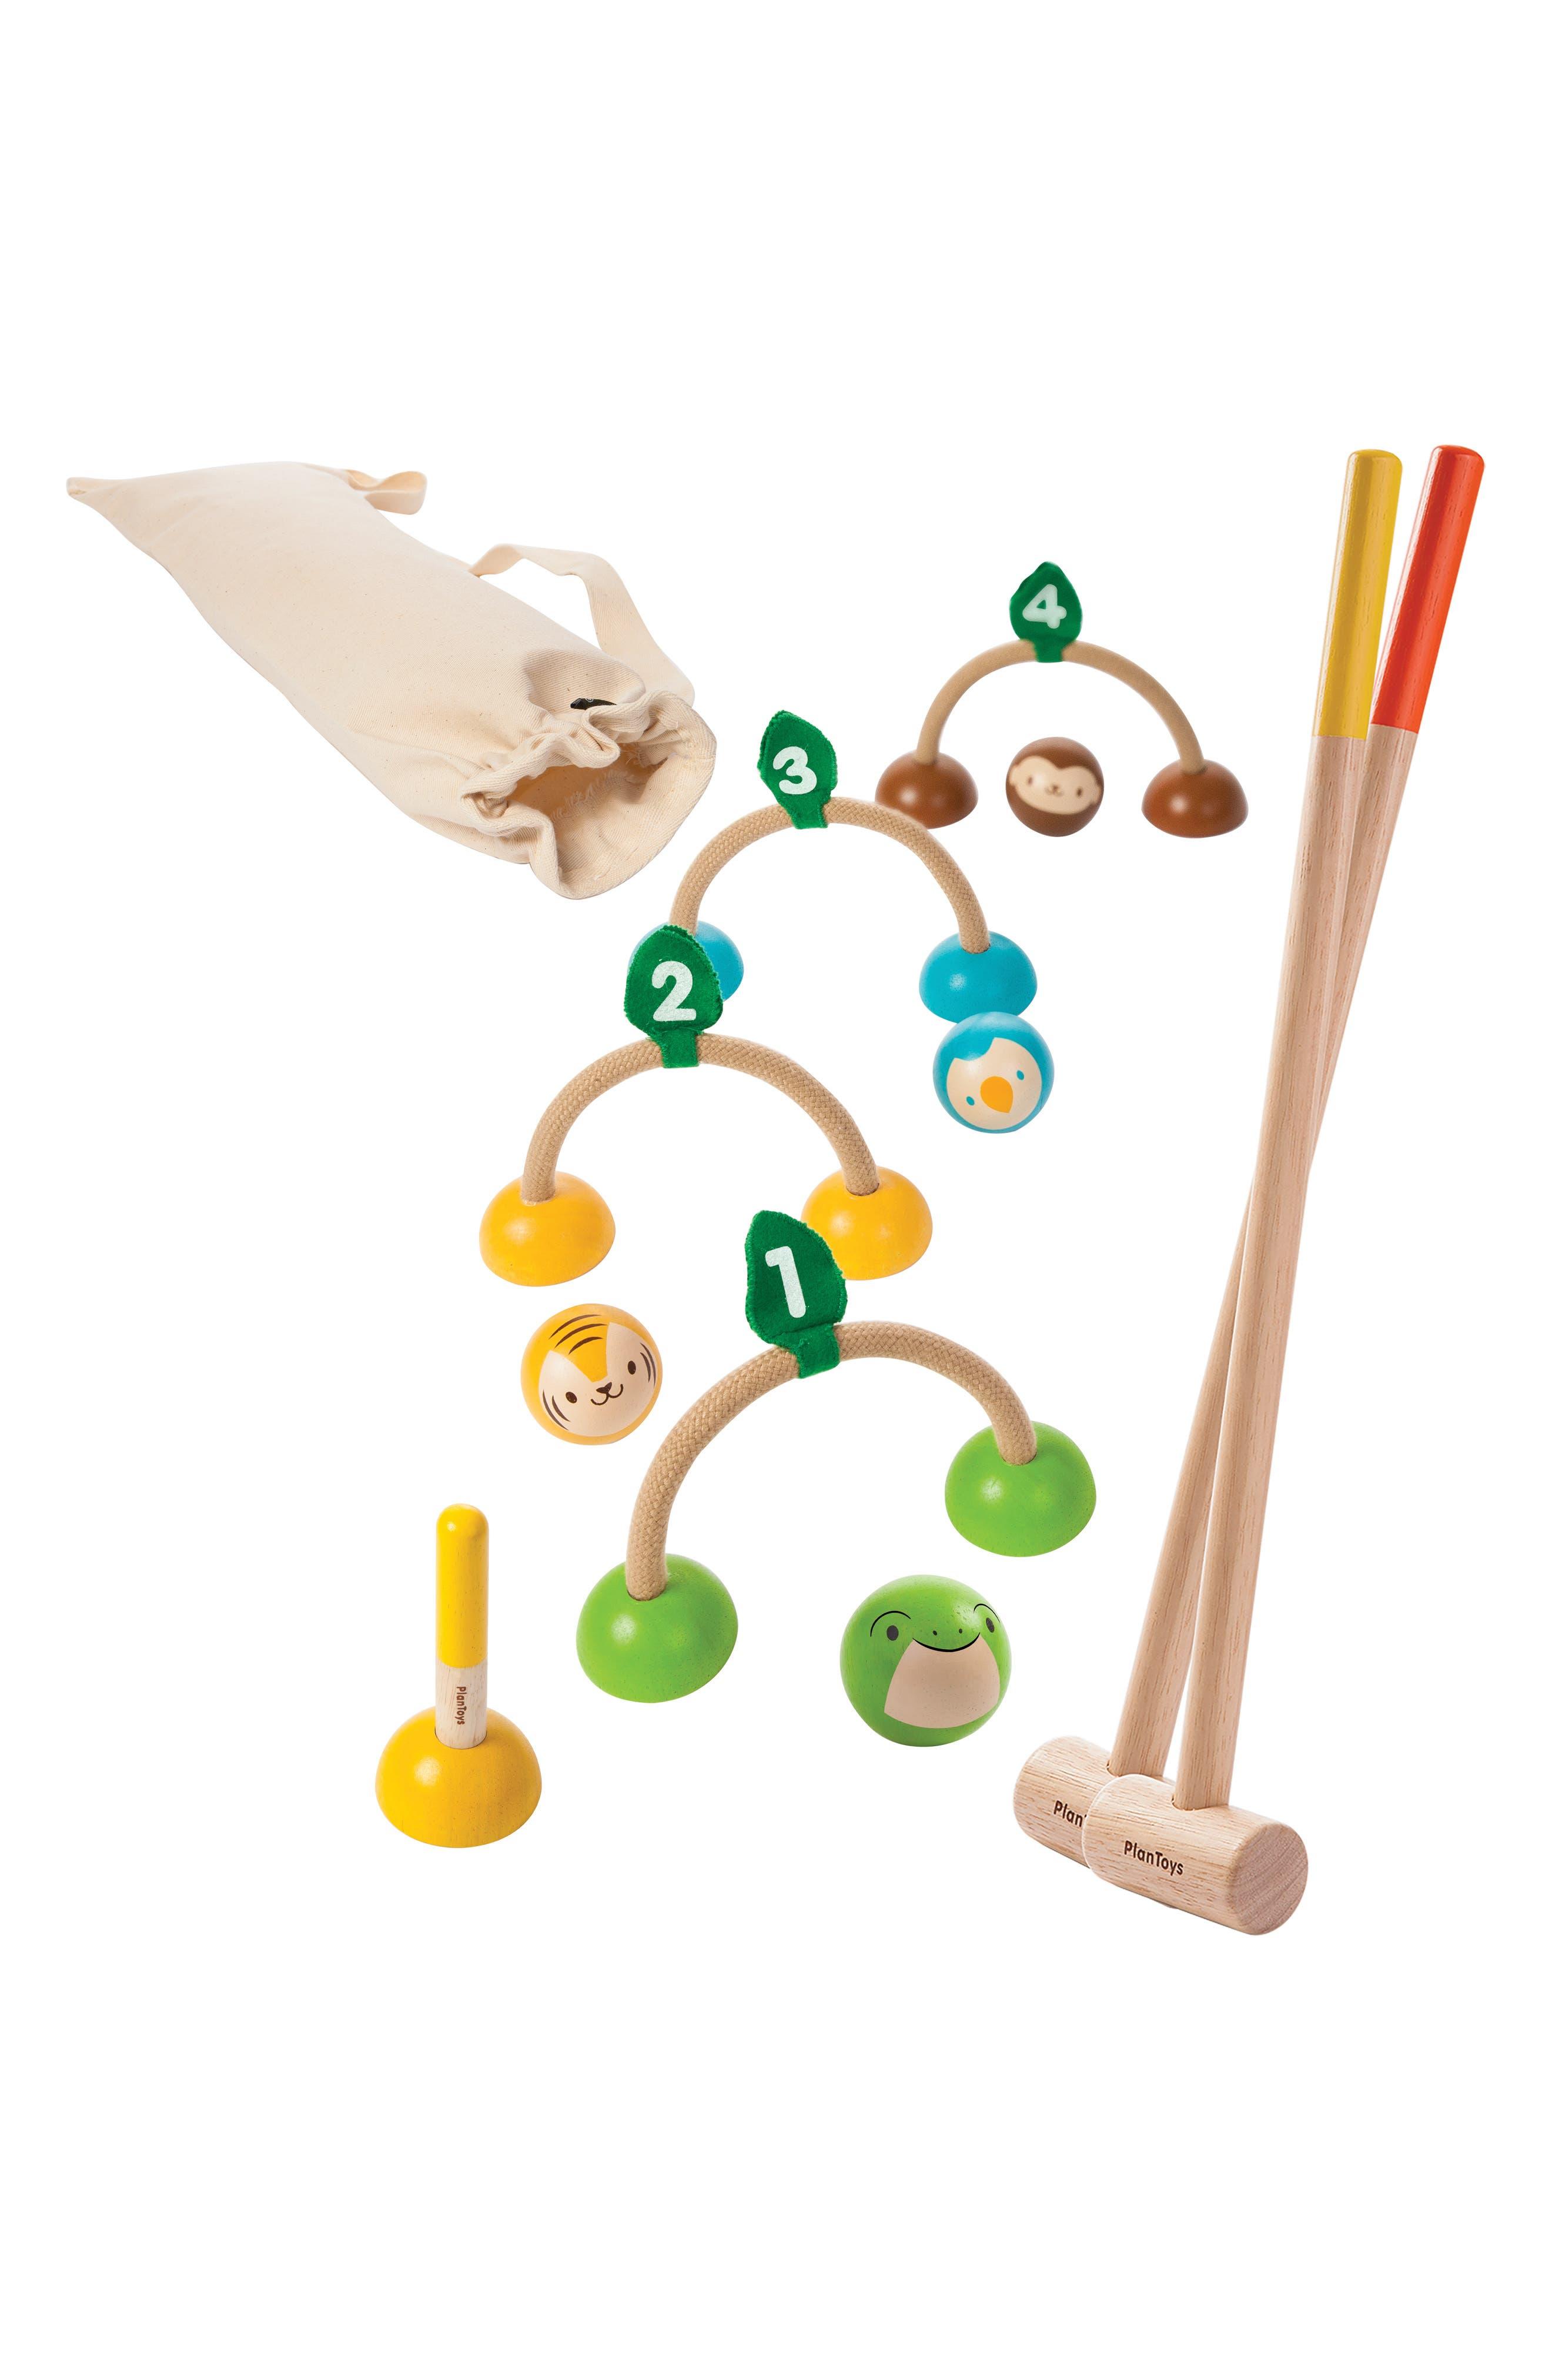 Plan Toys Croquet Set